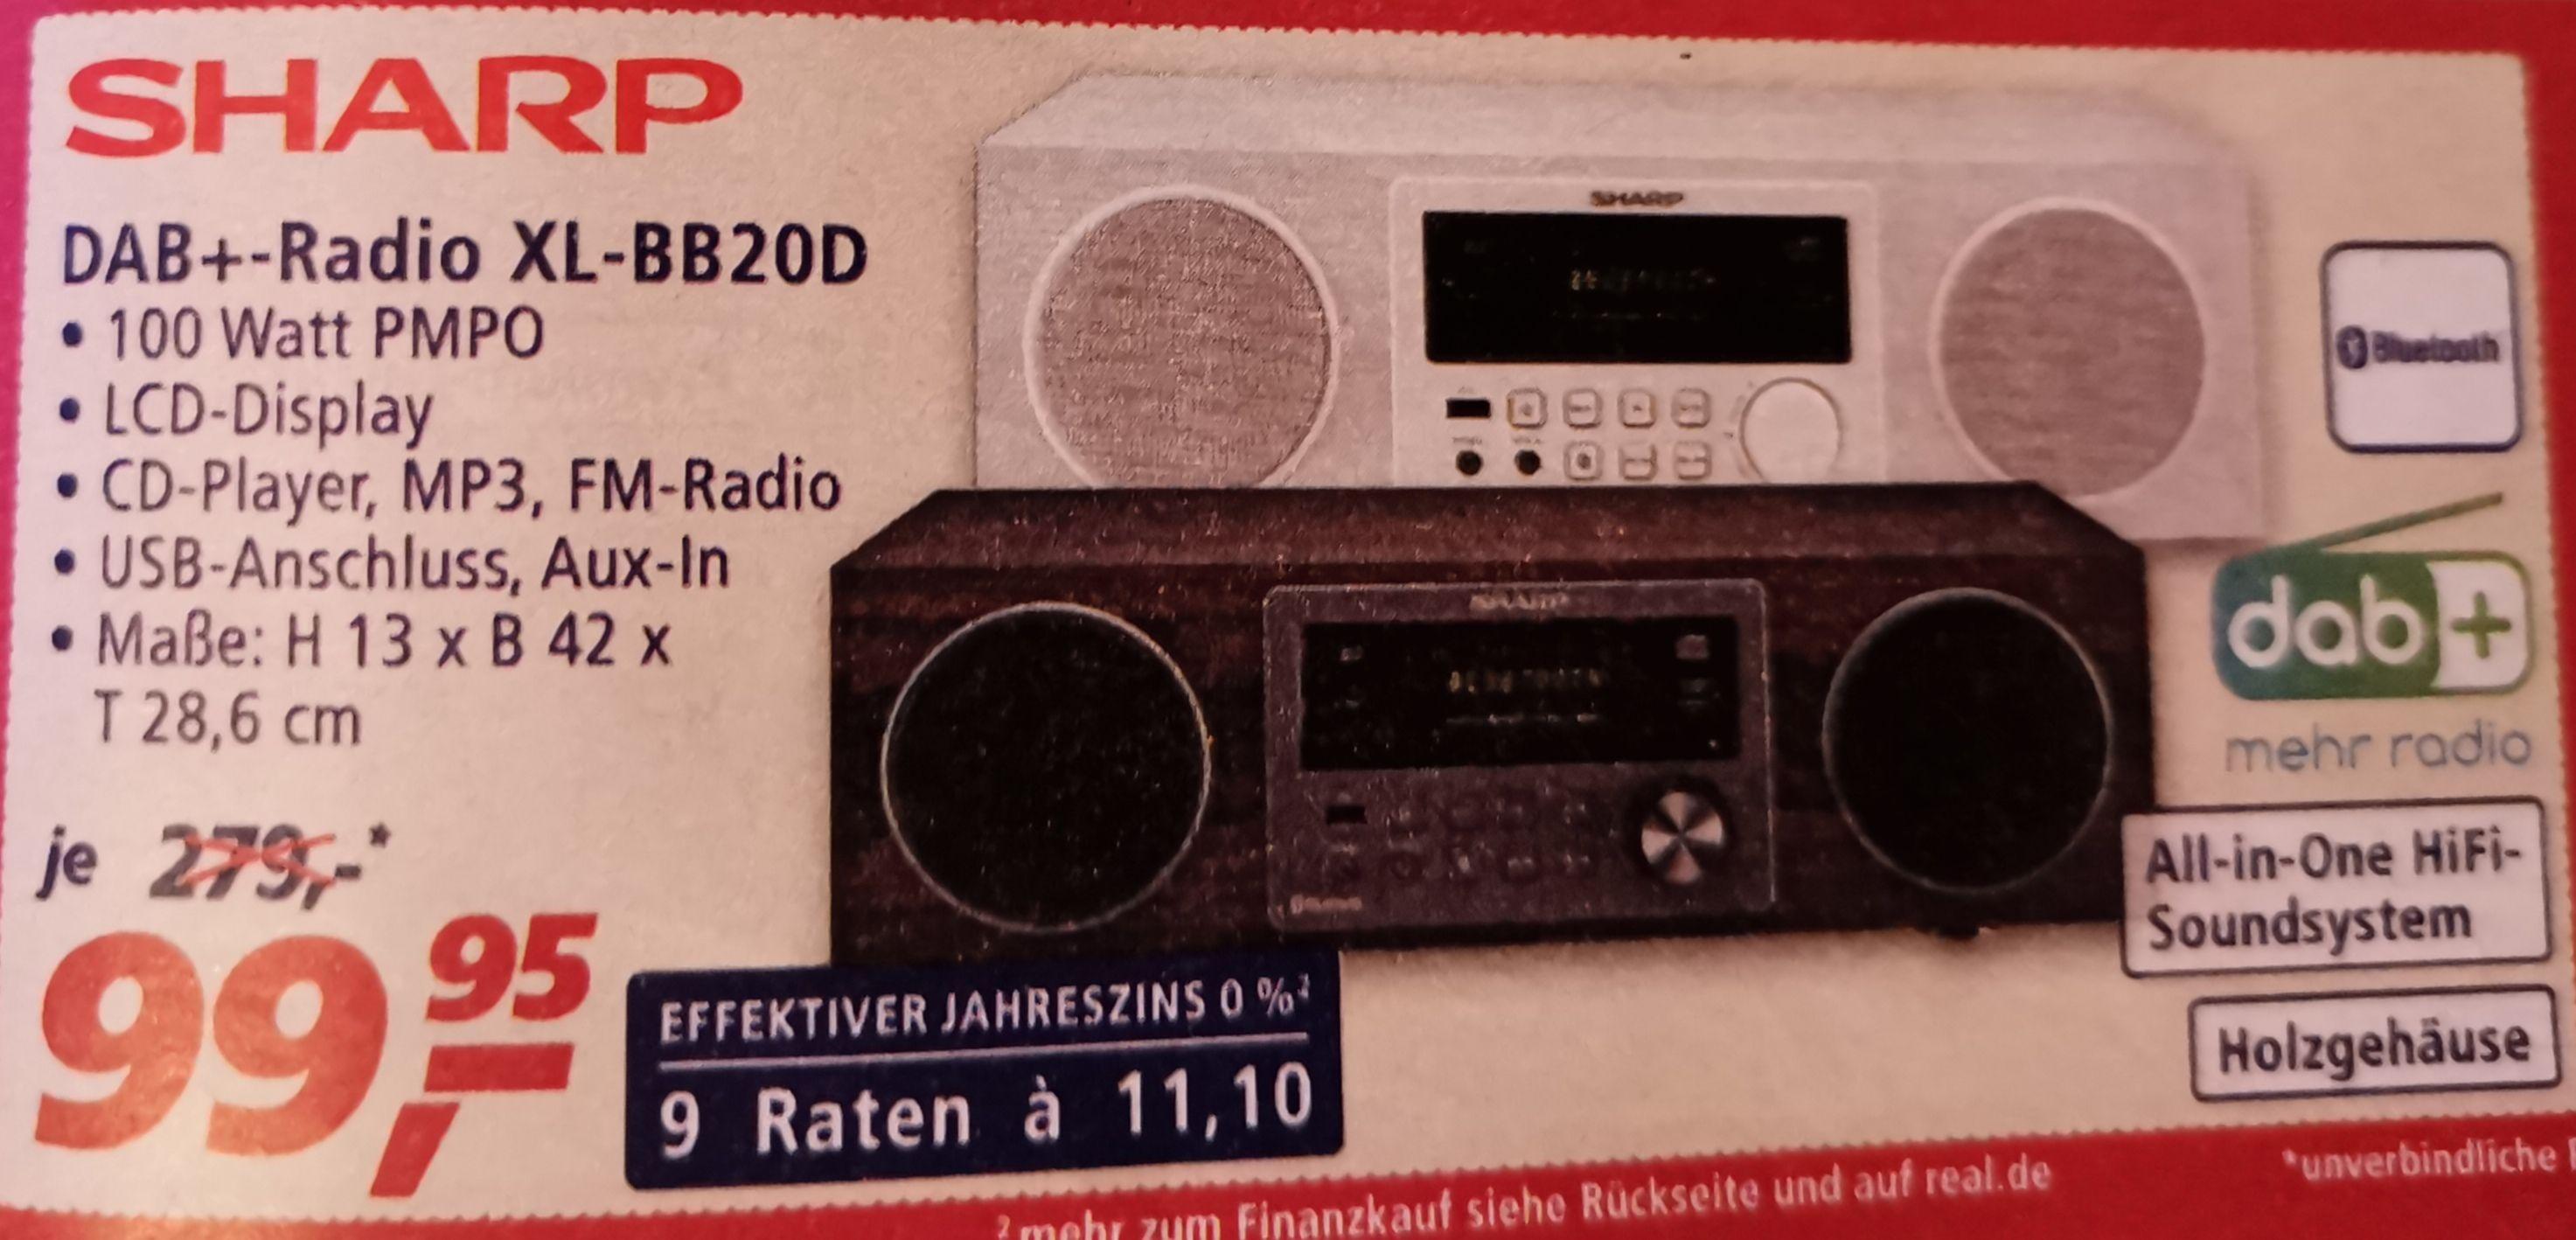 SHARP XL-BB20D(WH, BR) All in One HiFi-Soundsystem mit USB-Playback, Digital Radio, DAB, DAB+ und FM Tuner, Bluetooth, 100W, Holzoptik